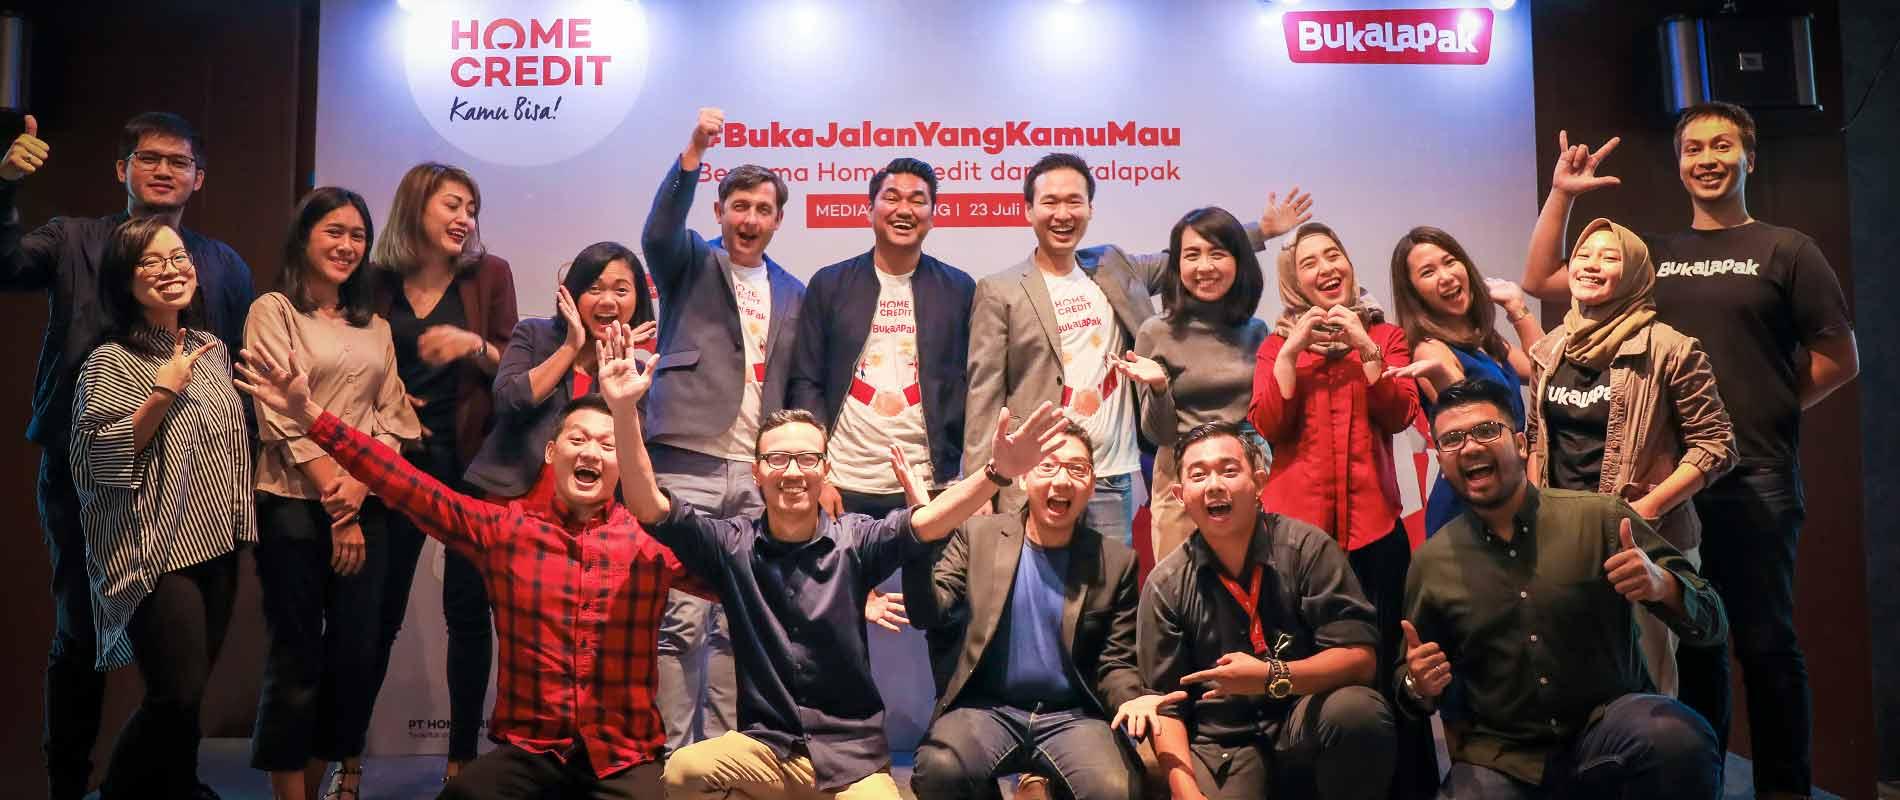 Gandeng Bukalapak, Home Credit Indonesia Bikin Akses Pembiayaan Online Makin Luas